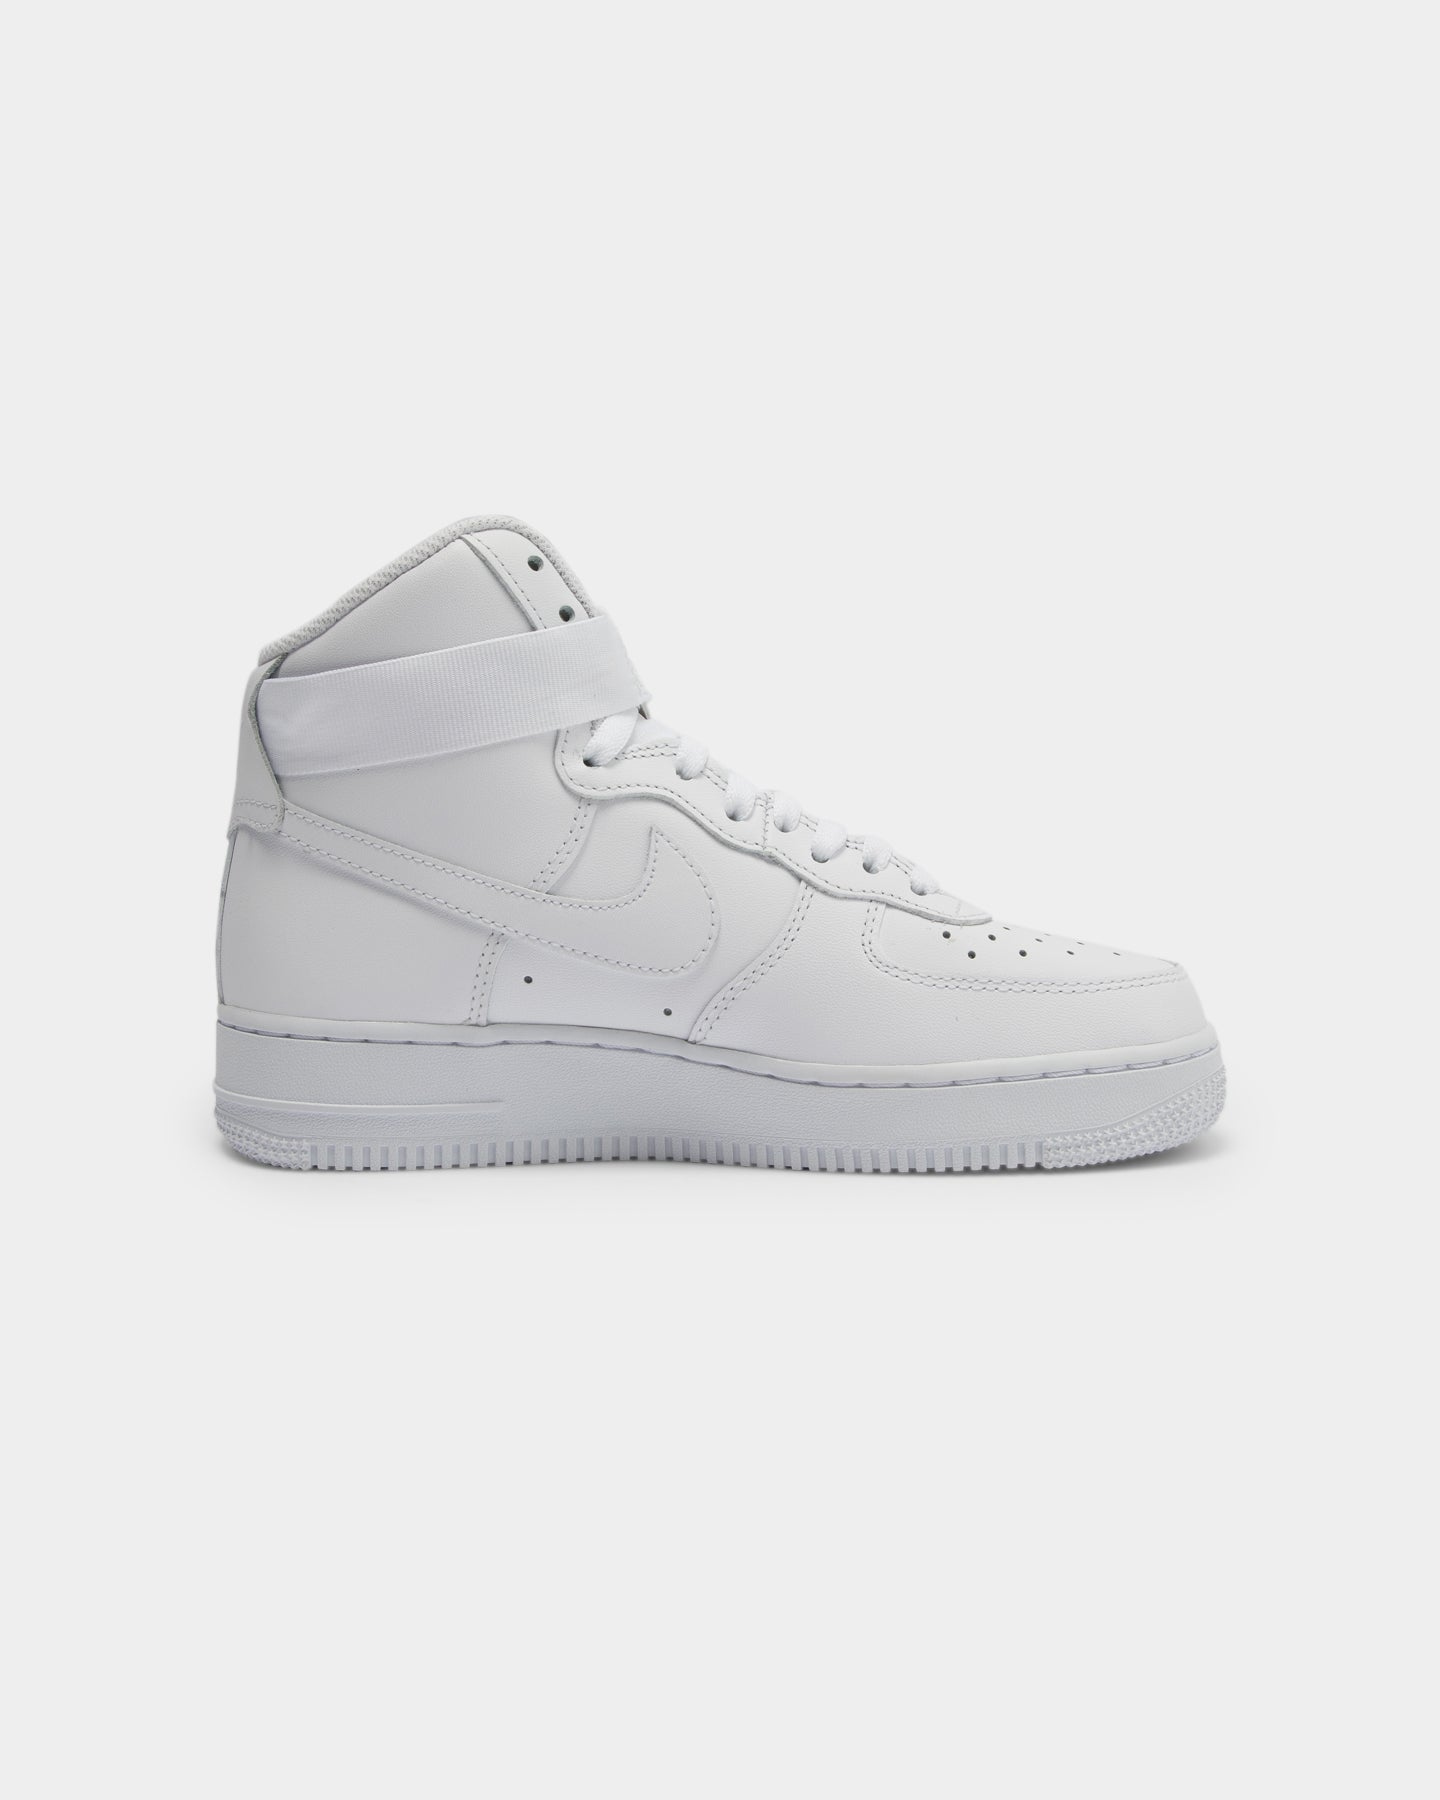 Nike Women's Air Force 1 High White